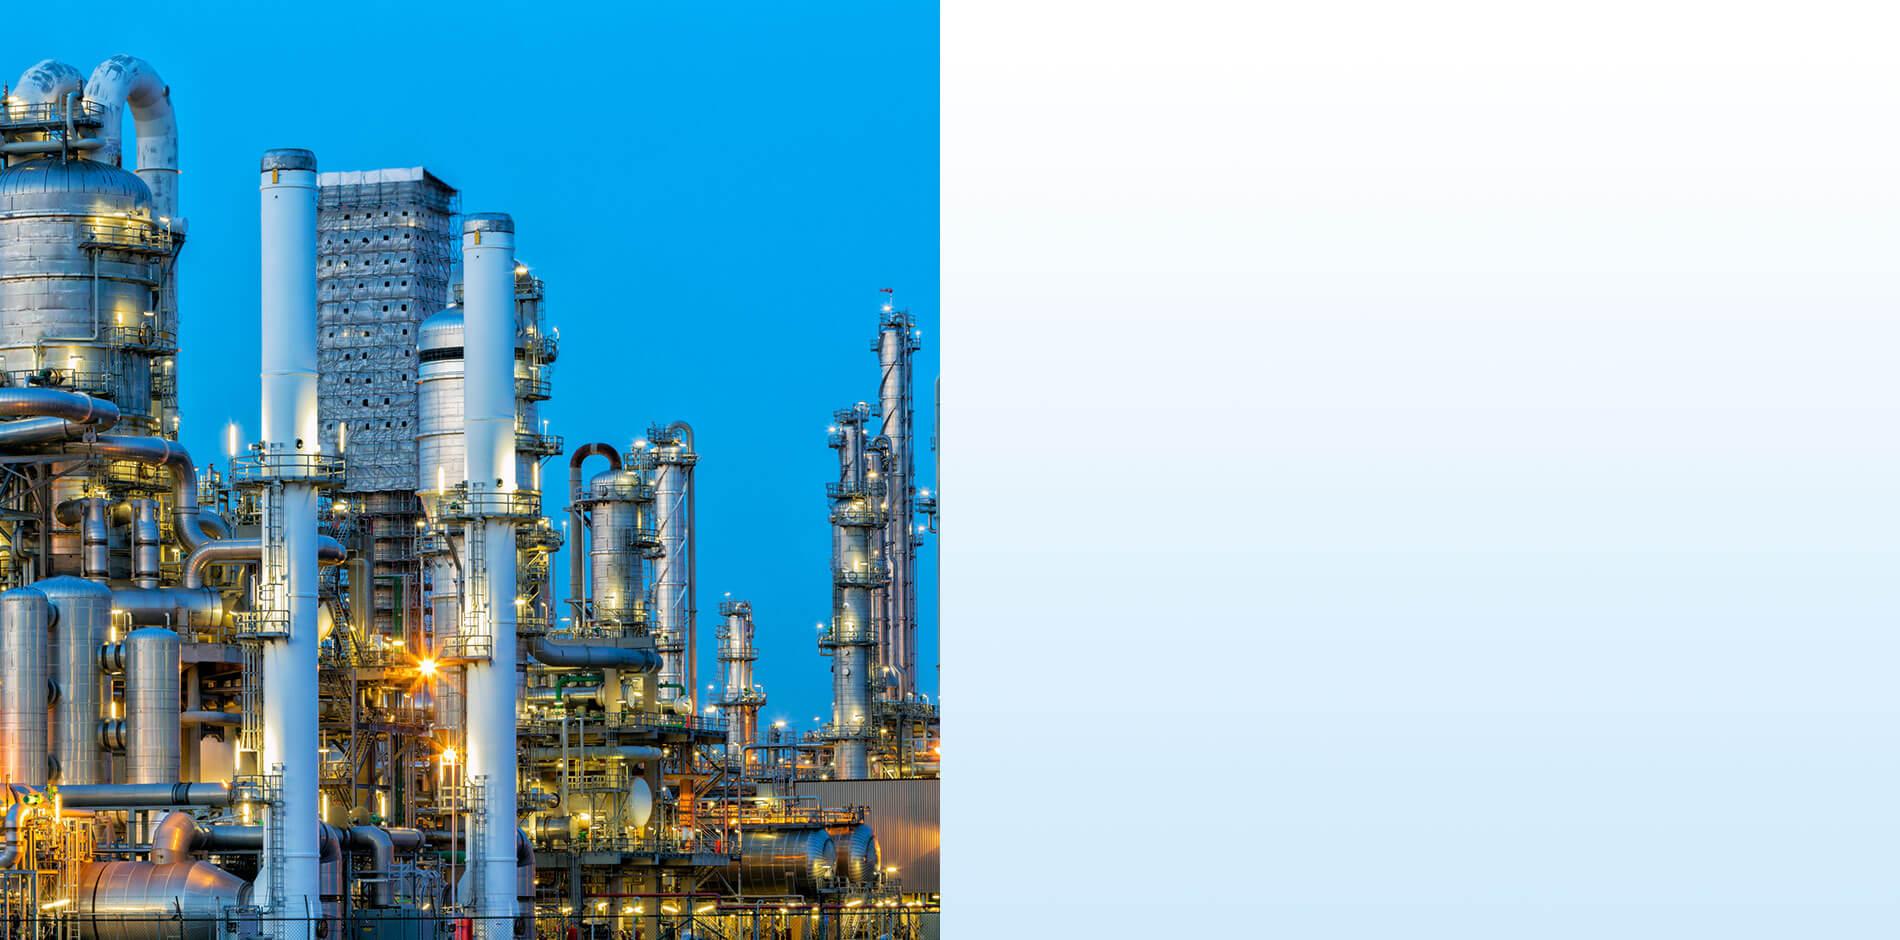 Fluid Concentration & Zero Liquid Discharge (ZLD)